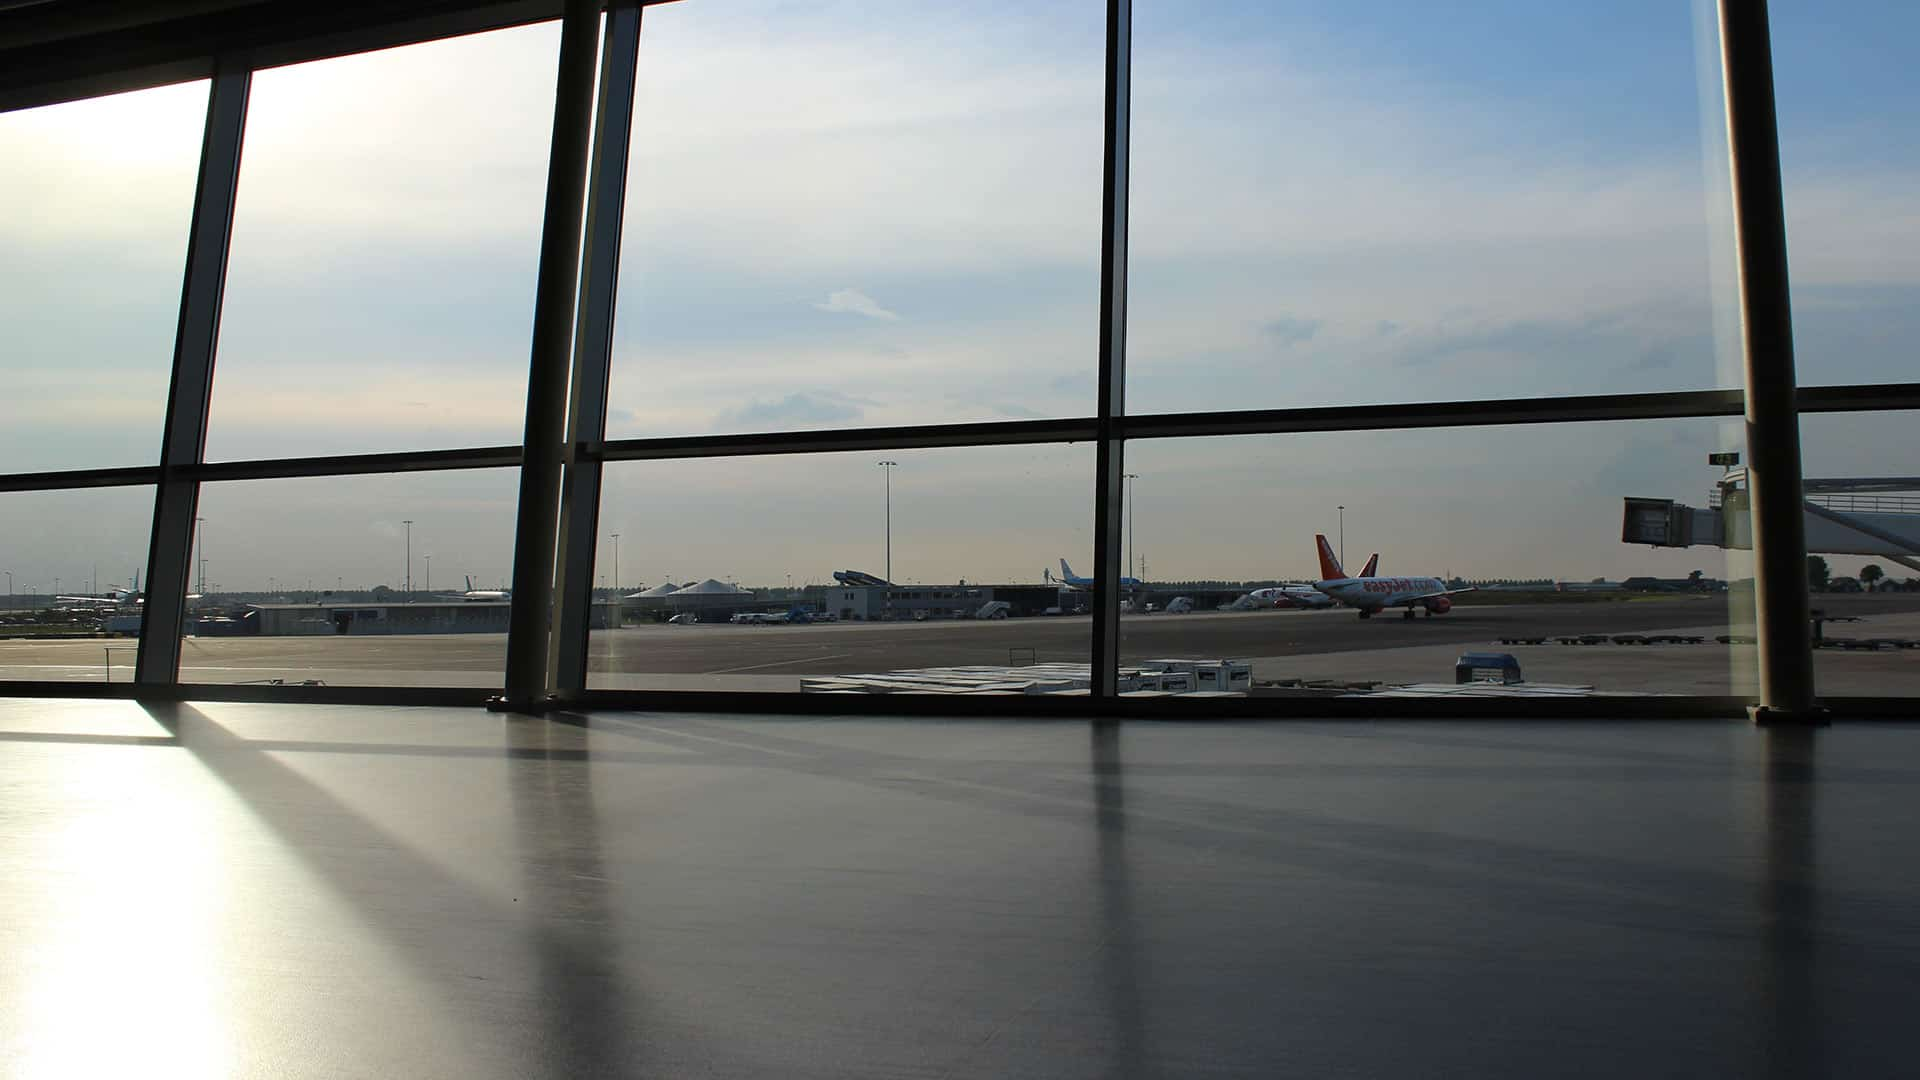 How to Get Cheap Flight Tickets